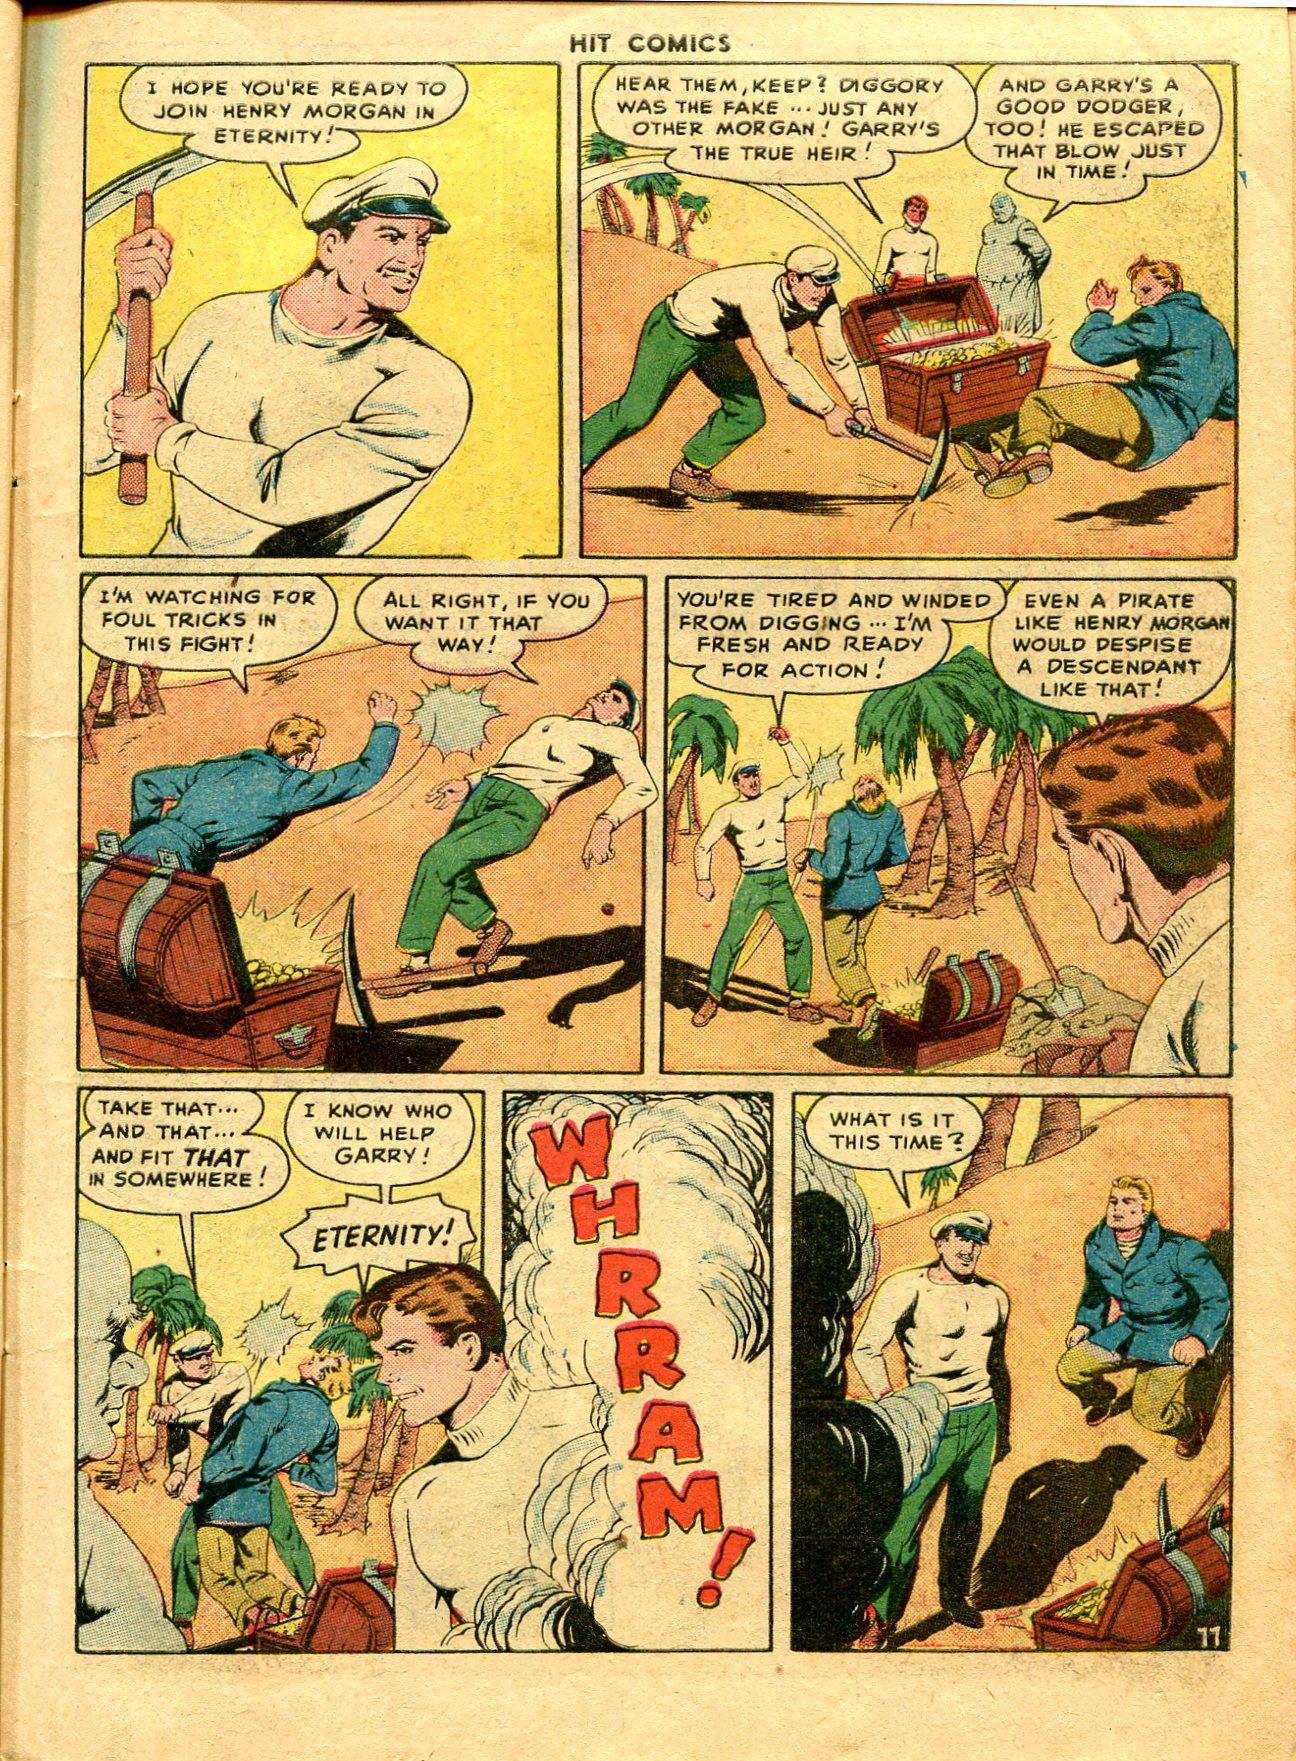 Read online Hit Comics comic -  Issue #48 - 13